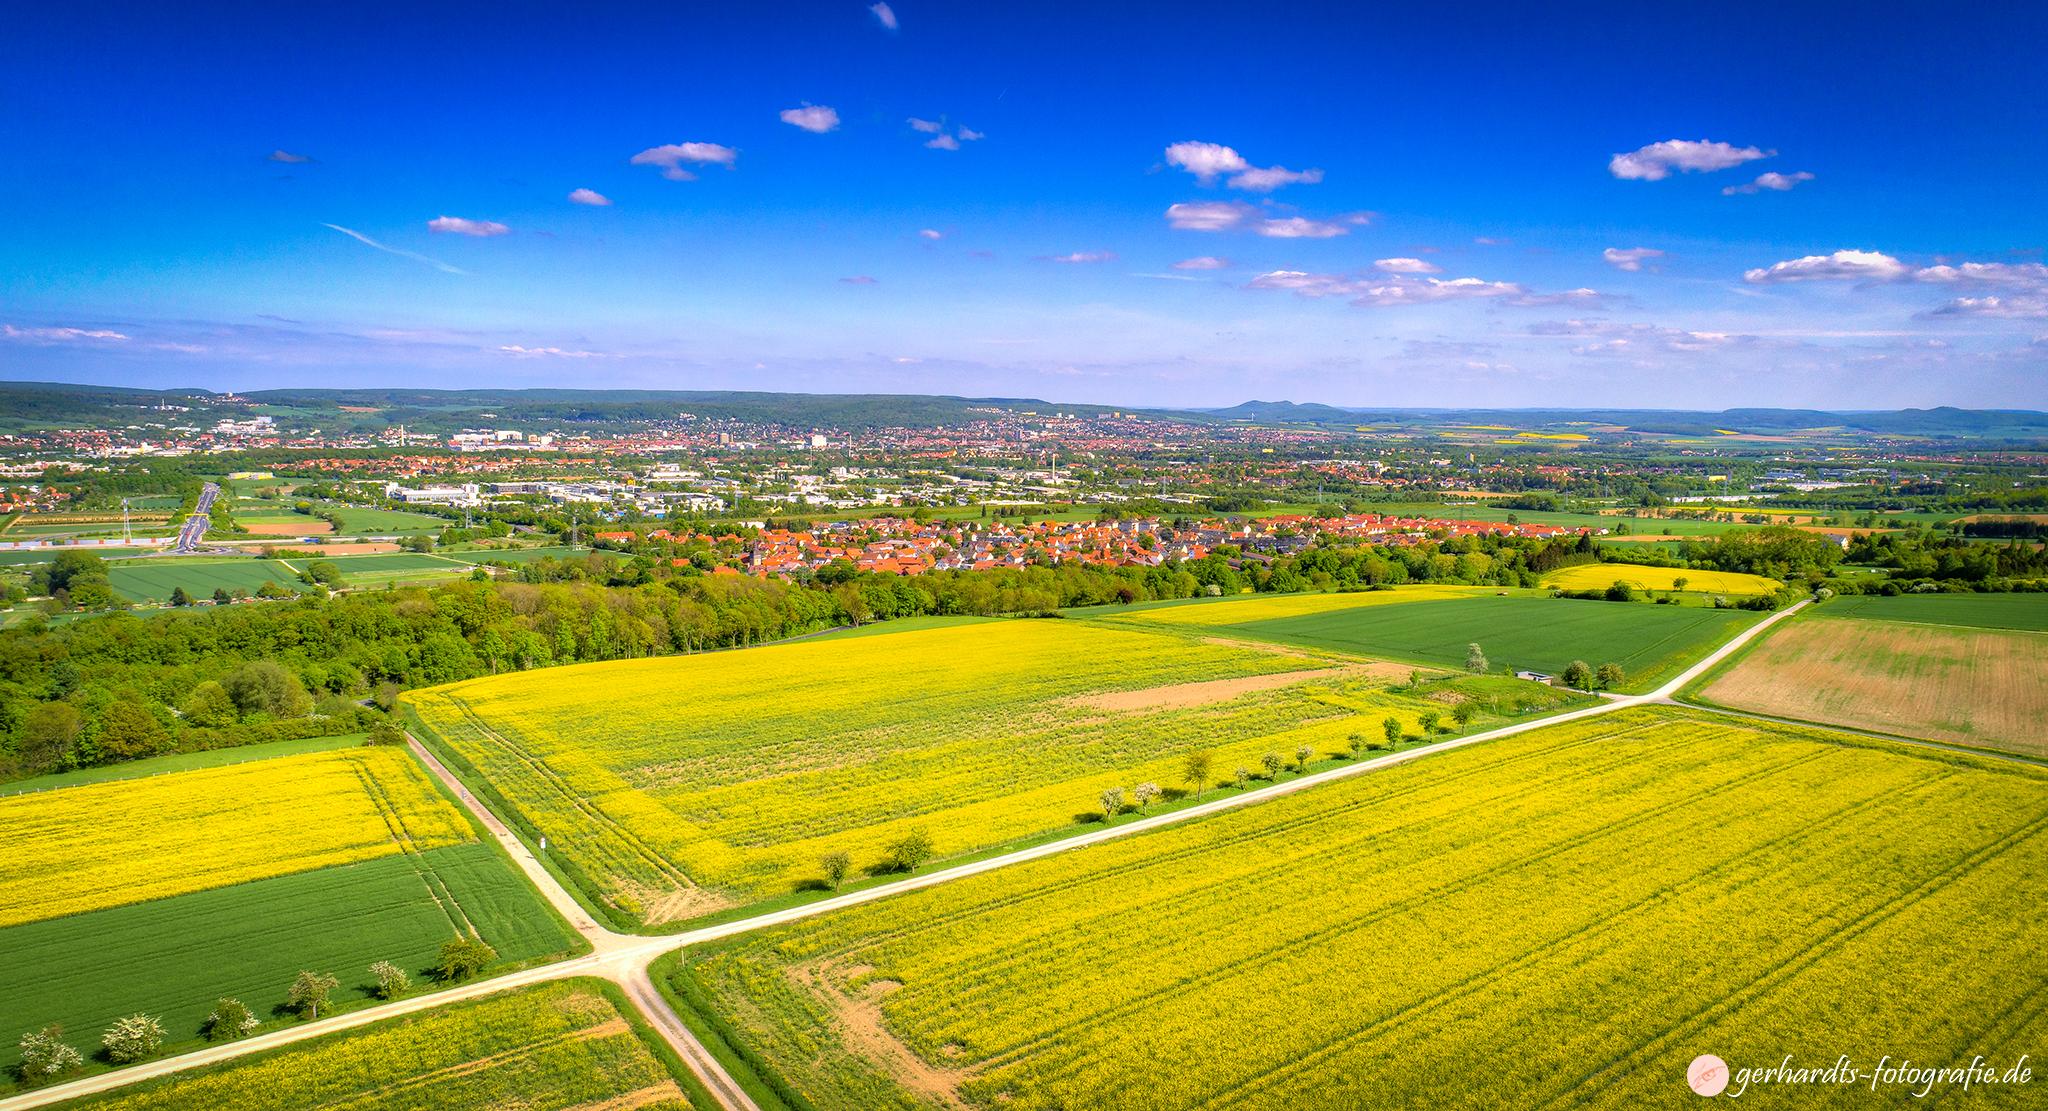 Luftbild Göttingen Rapsblüte